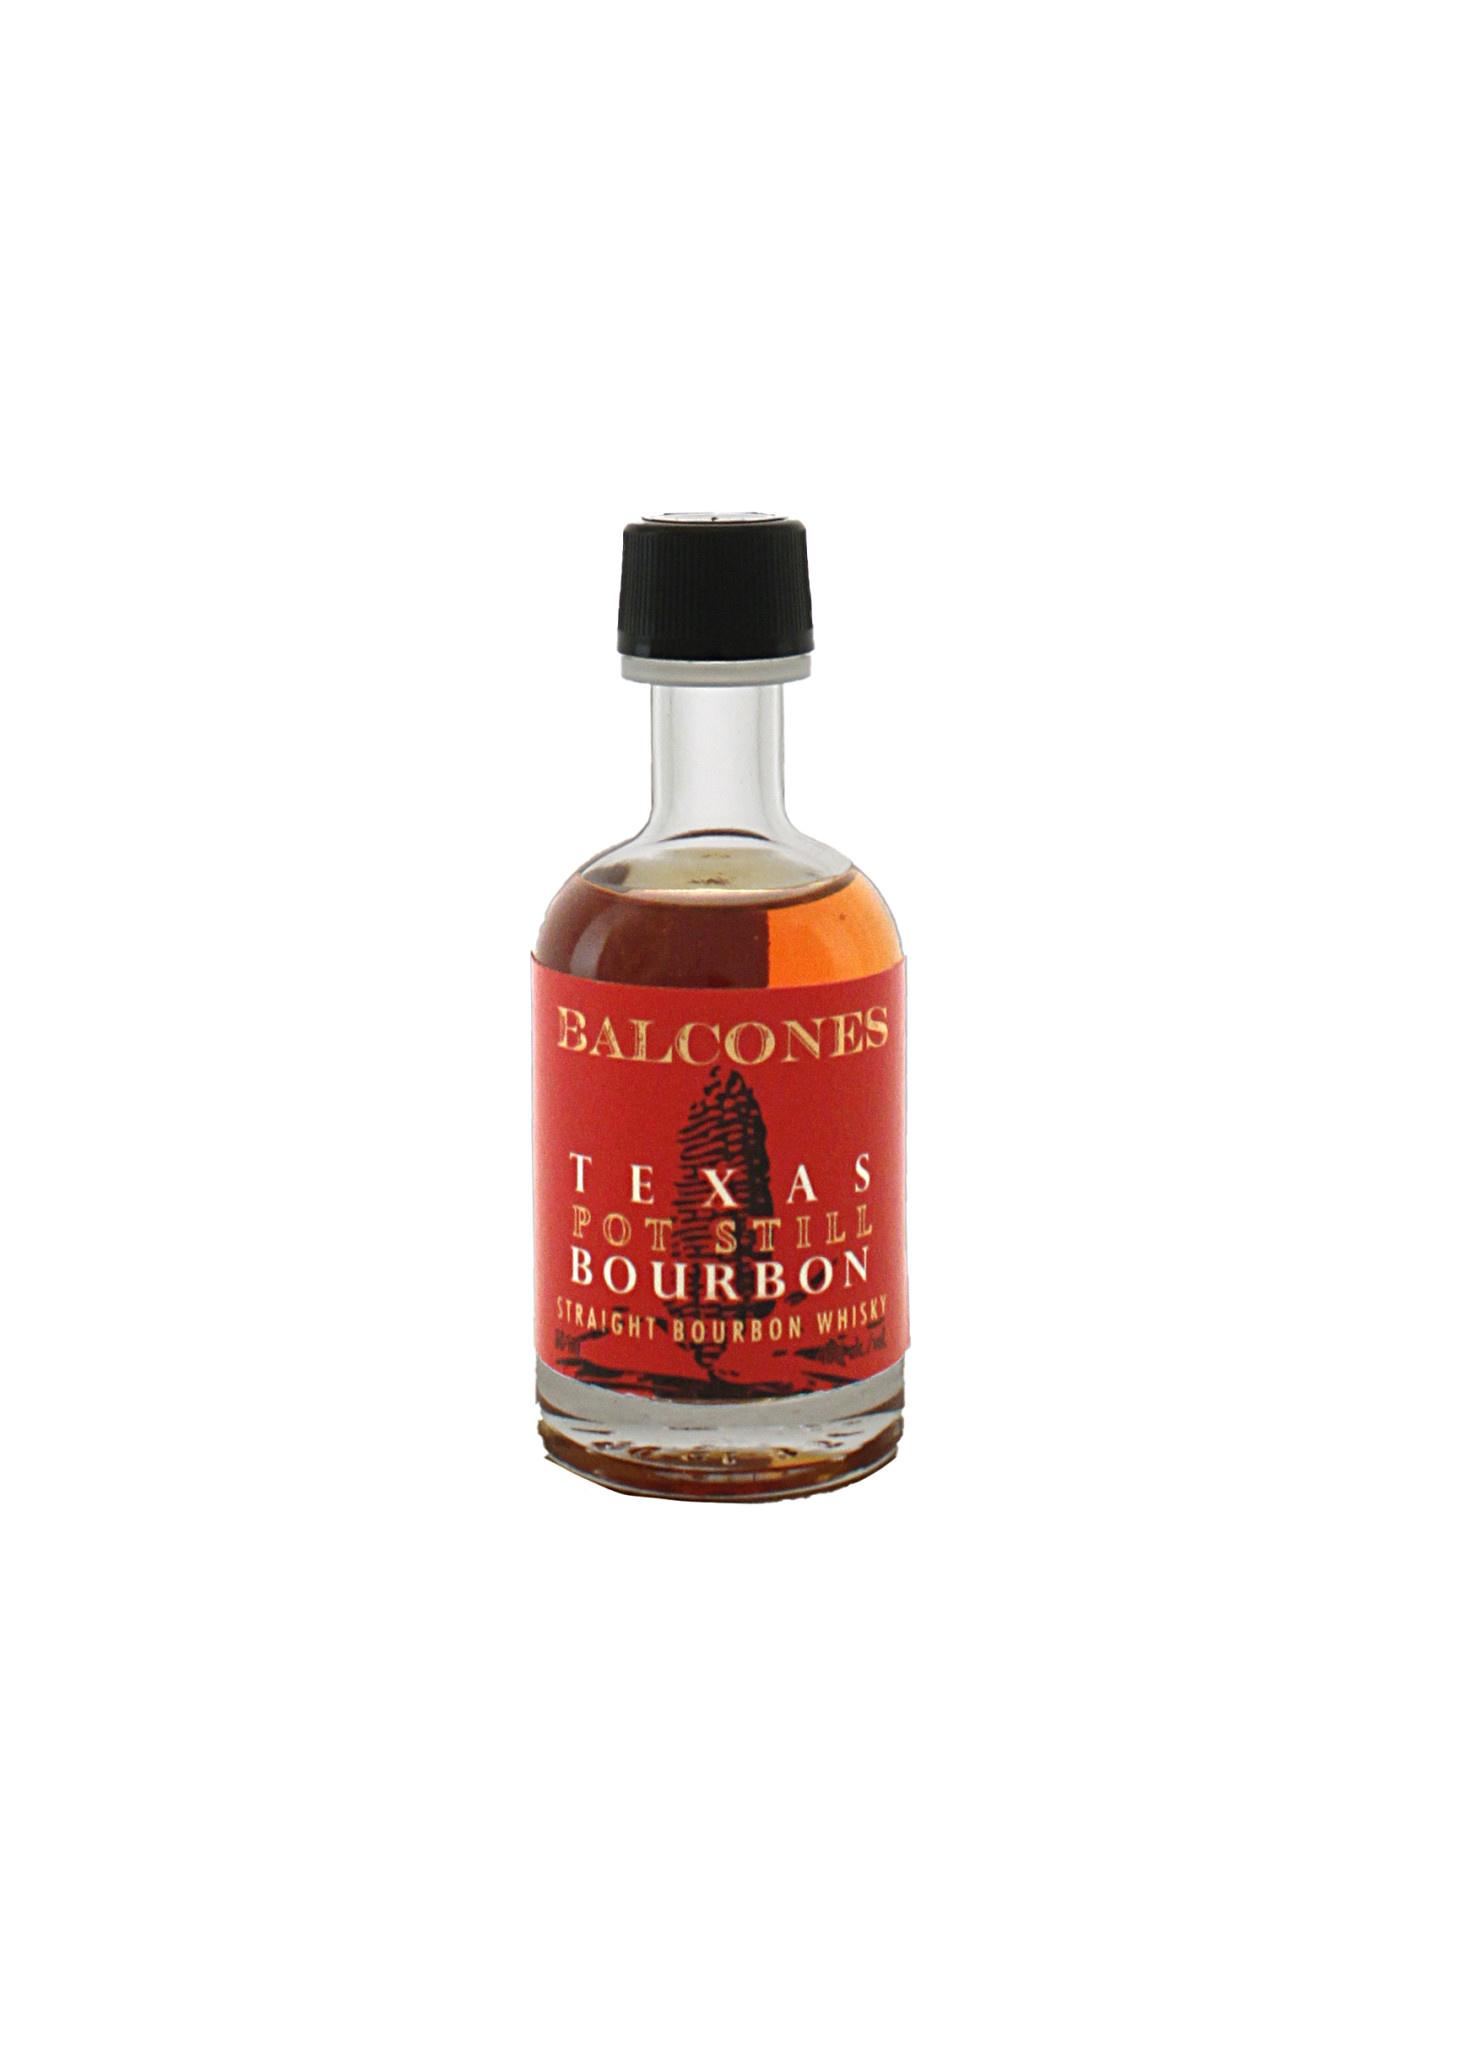 Balcones Texas Pot Still Bourbon Whiskey 50ml.